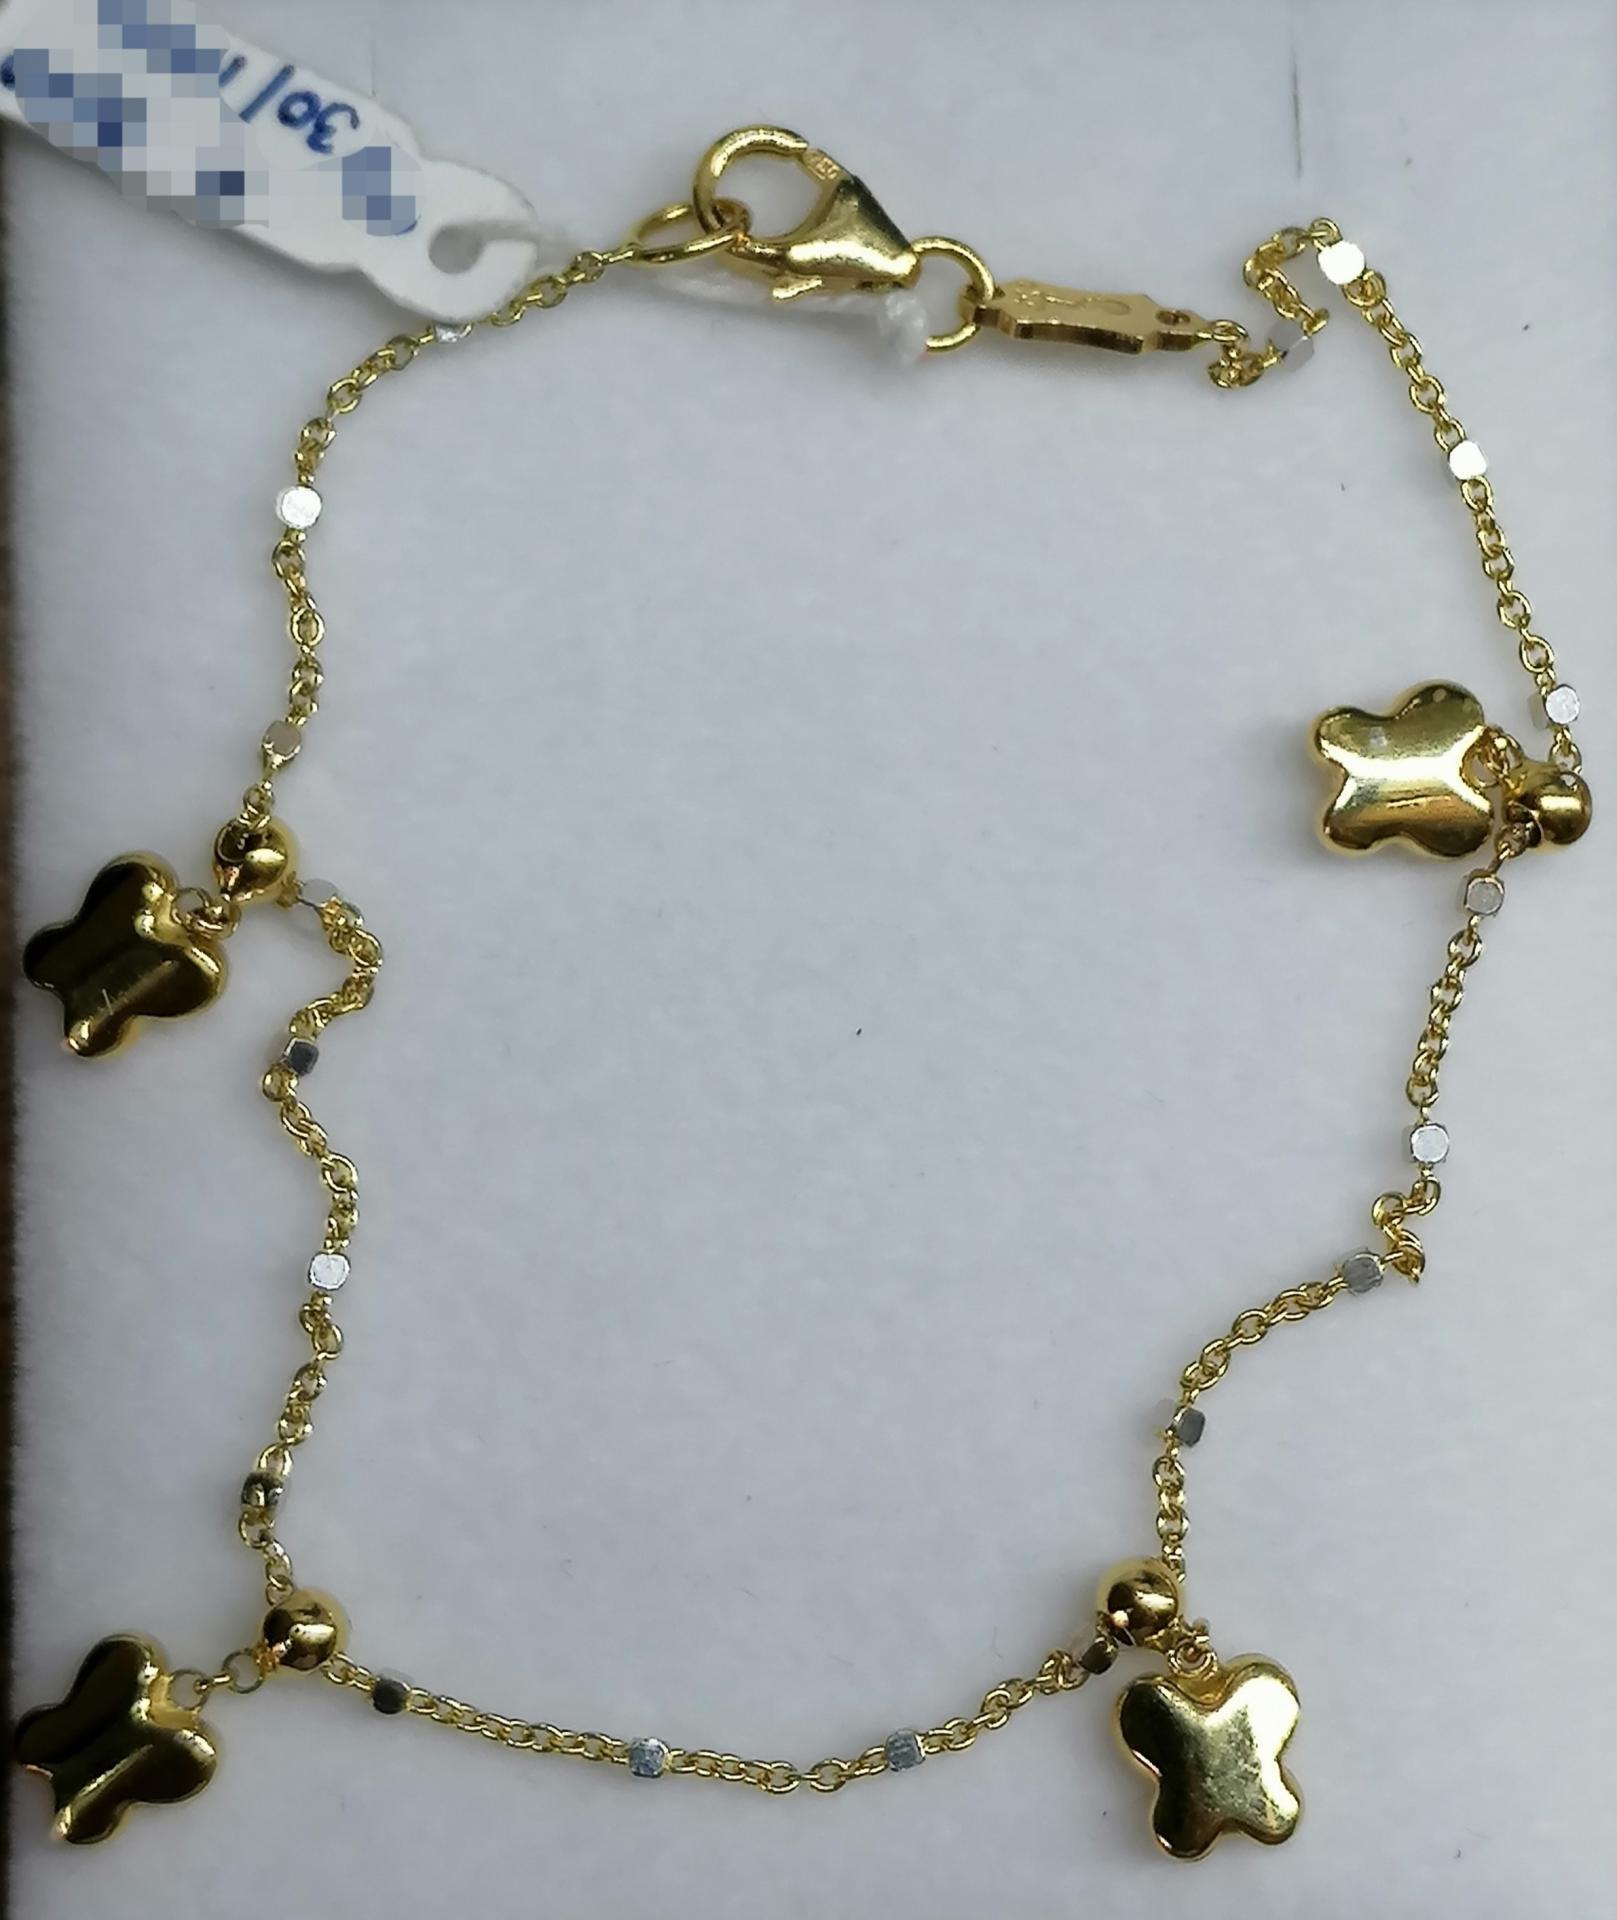 Juvenil Pulsera Oro Tipo Cadena Con Colgantes Mariposas Oro 18 Quilates